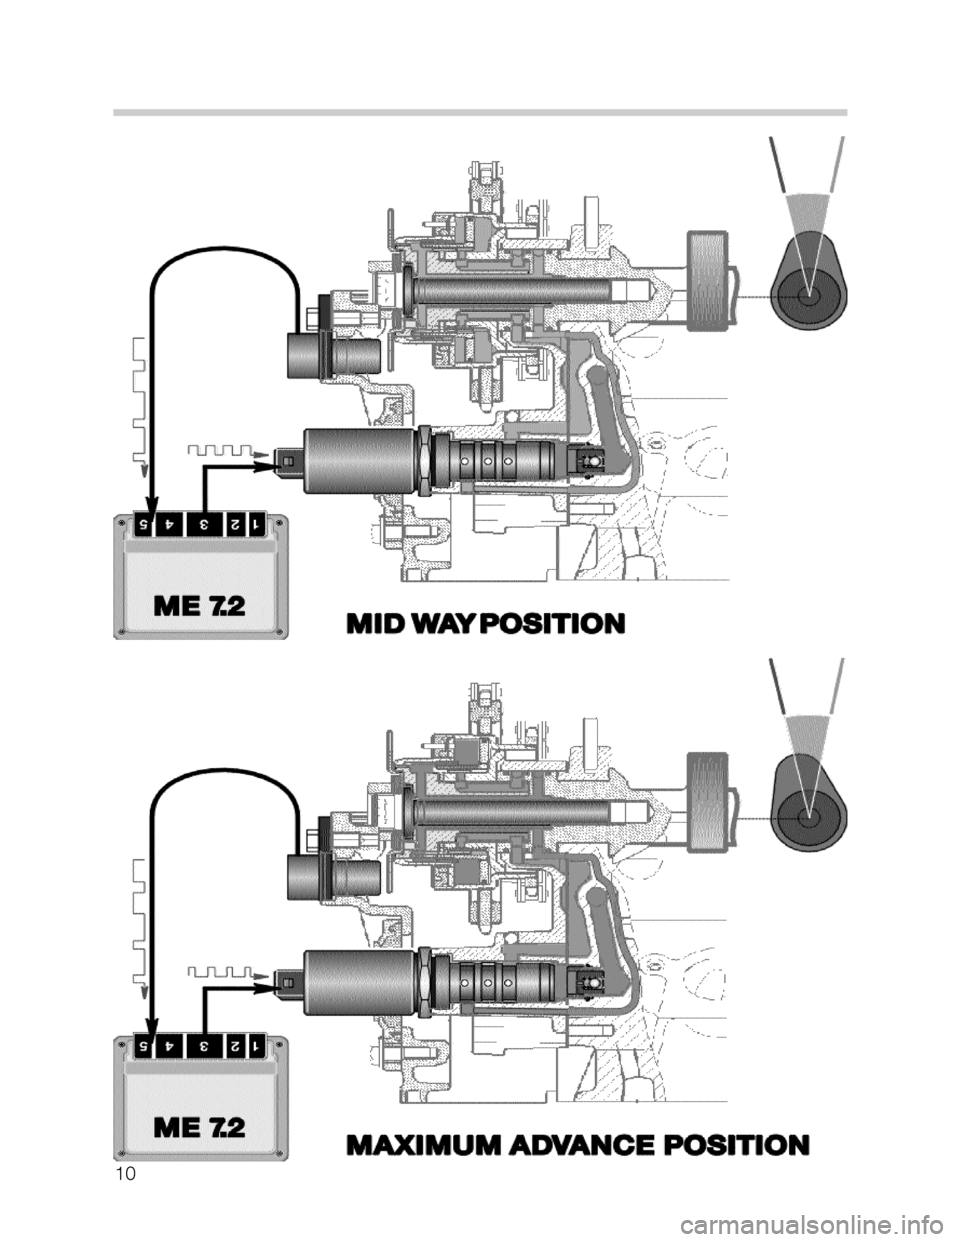 Bmw 740i 2001 E38 M62tu Engine Workshop Manual Diagram